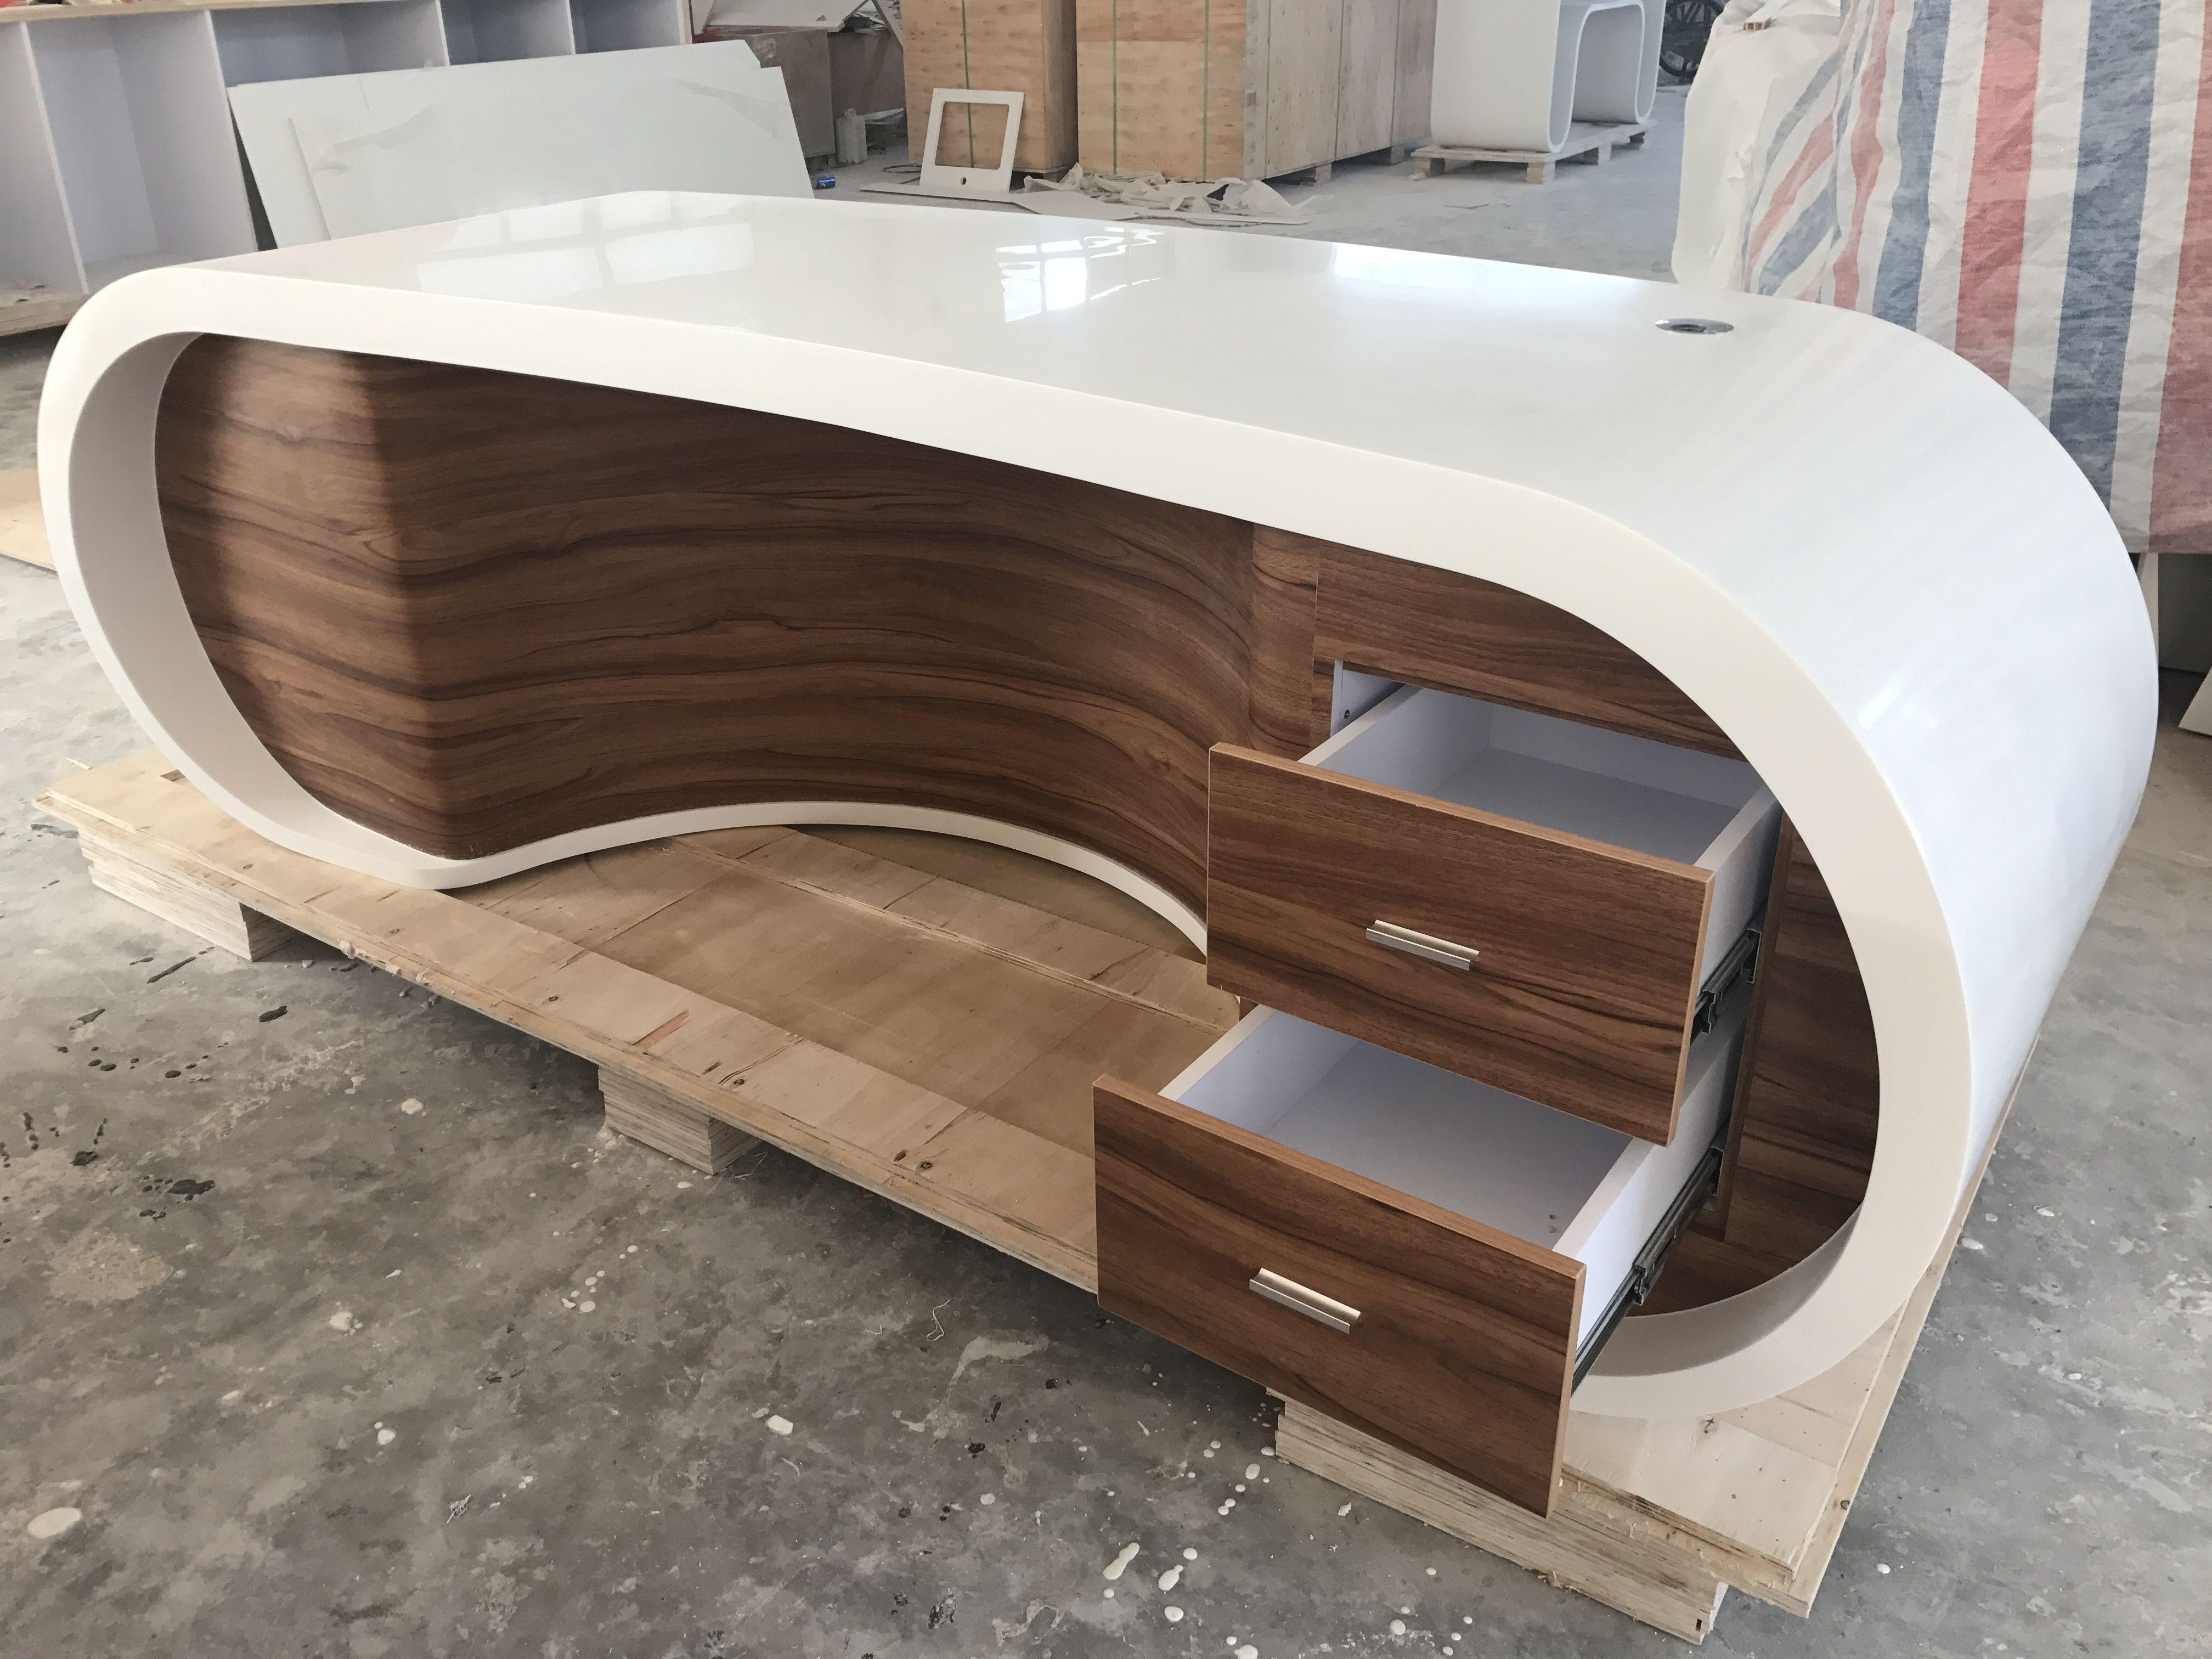 Idea By Jose Ricardo Trovao On Madeira Buy Office Furniture